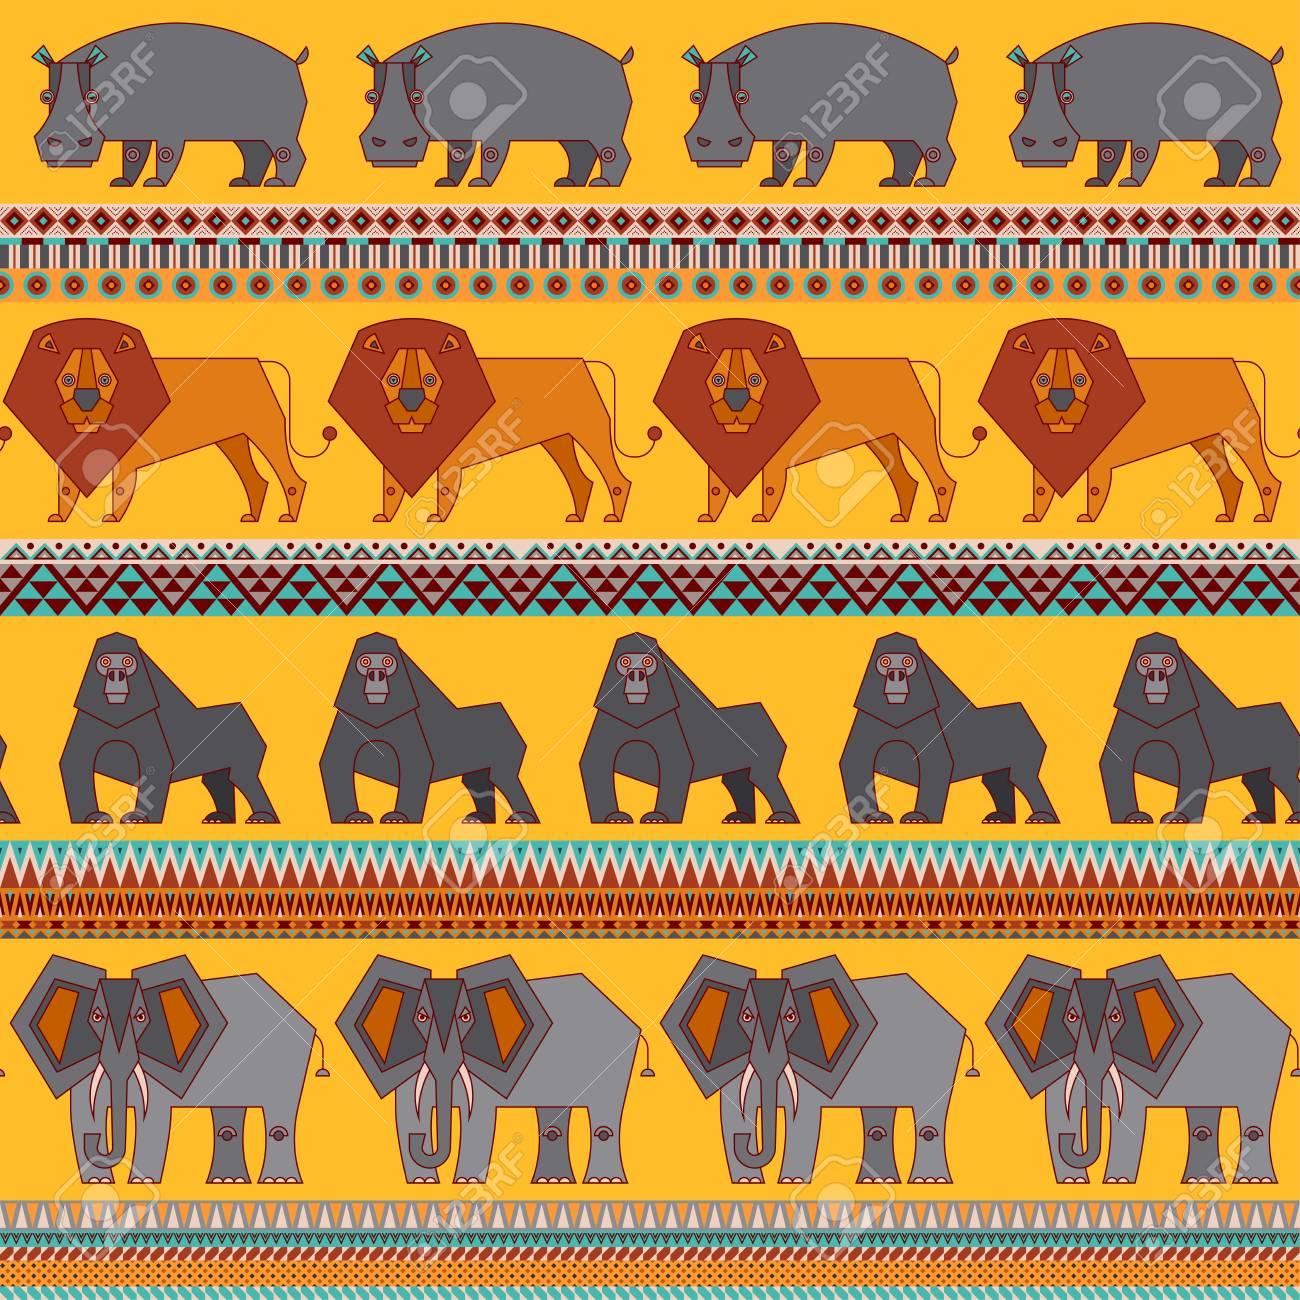 Set of African animals. Hippo, lion, elephant, gorilla. Geometric style. Vector illustration - 122865779